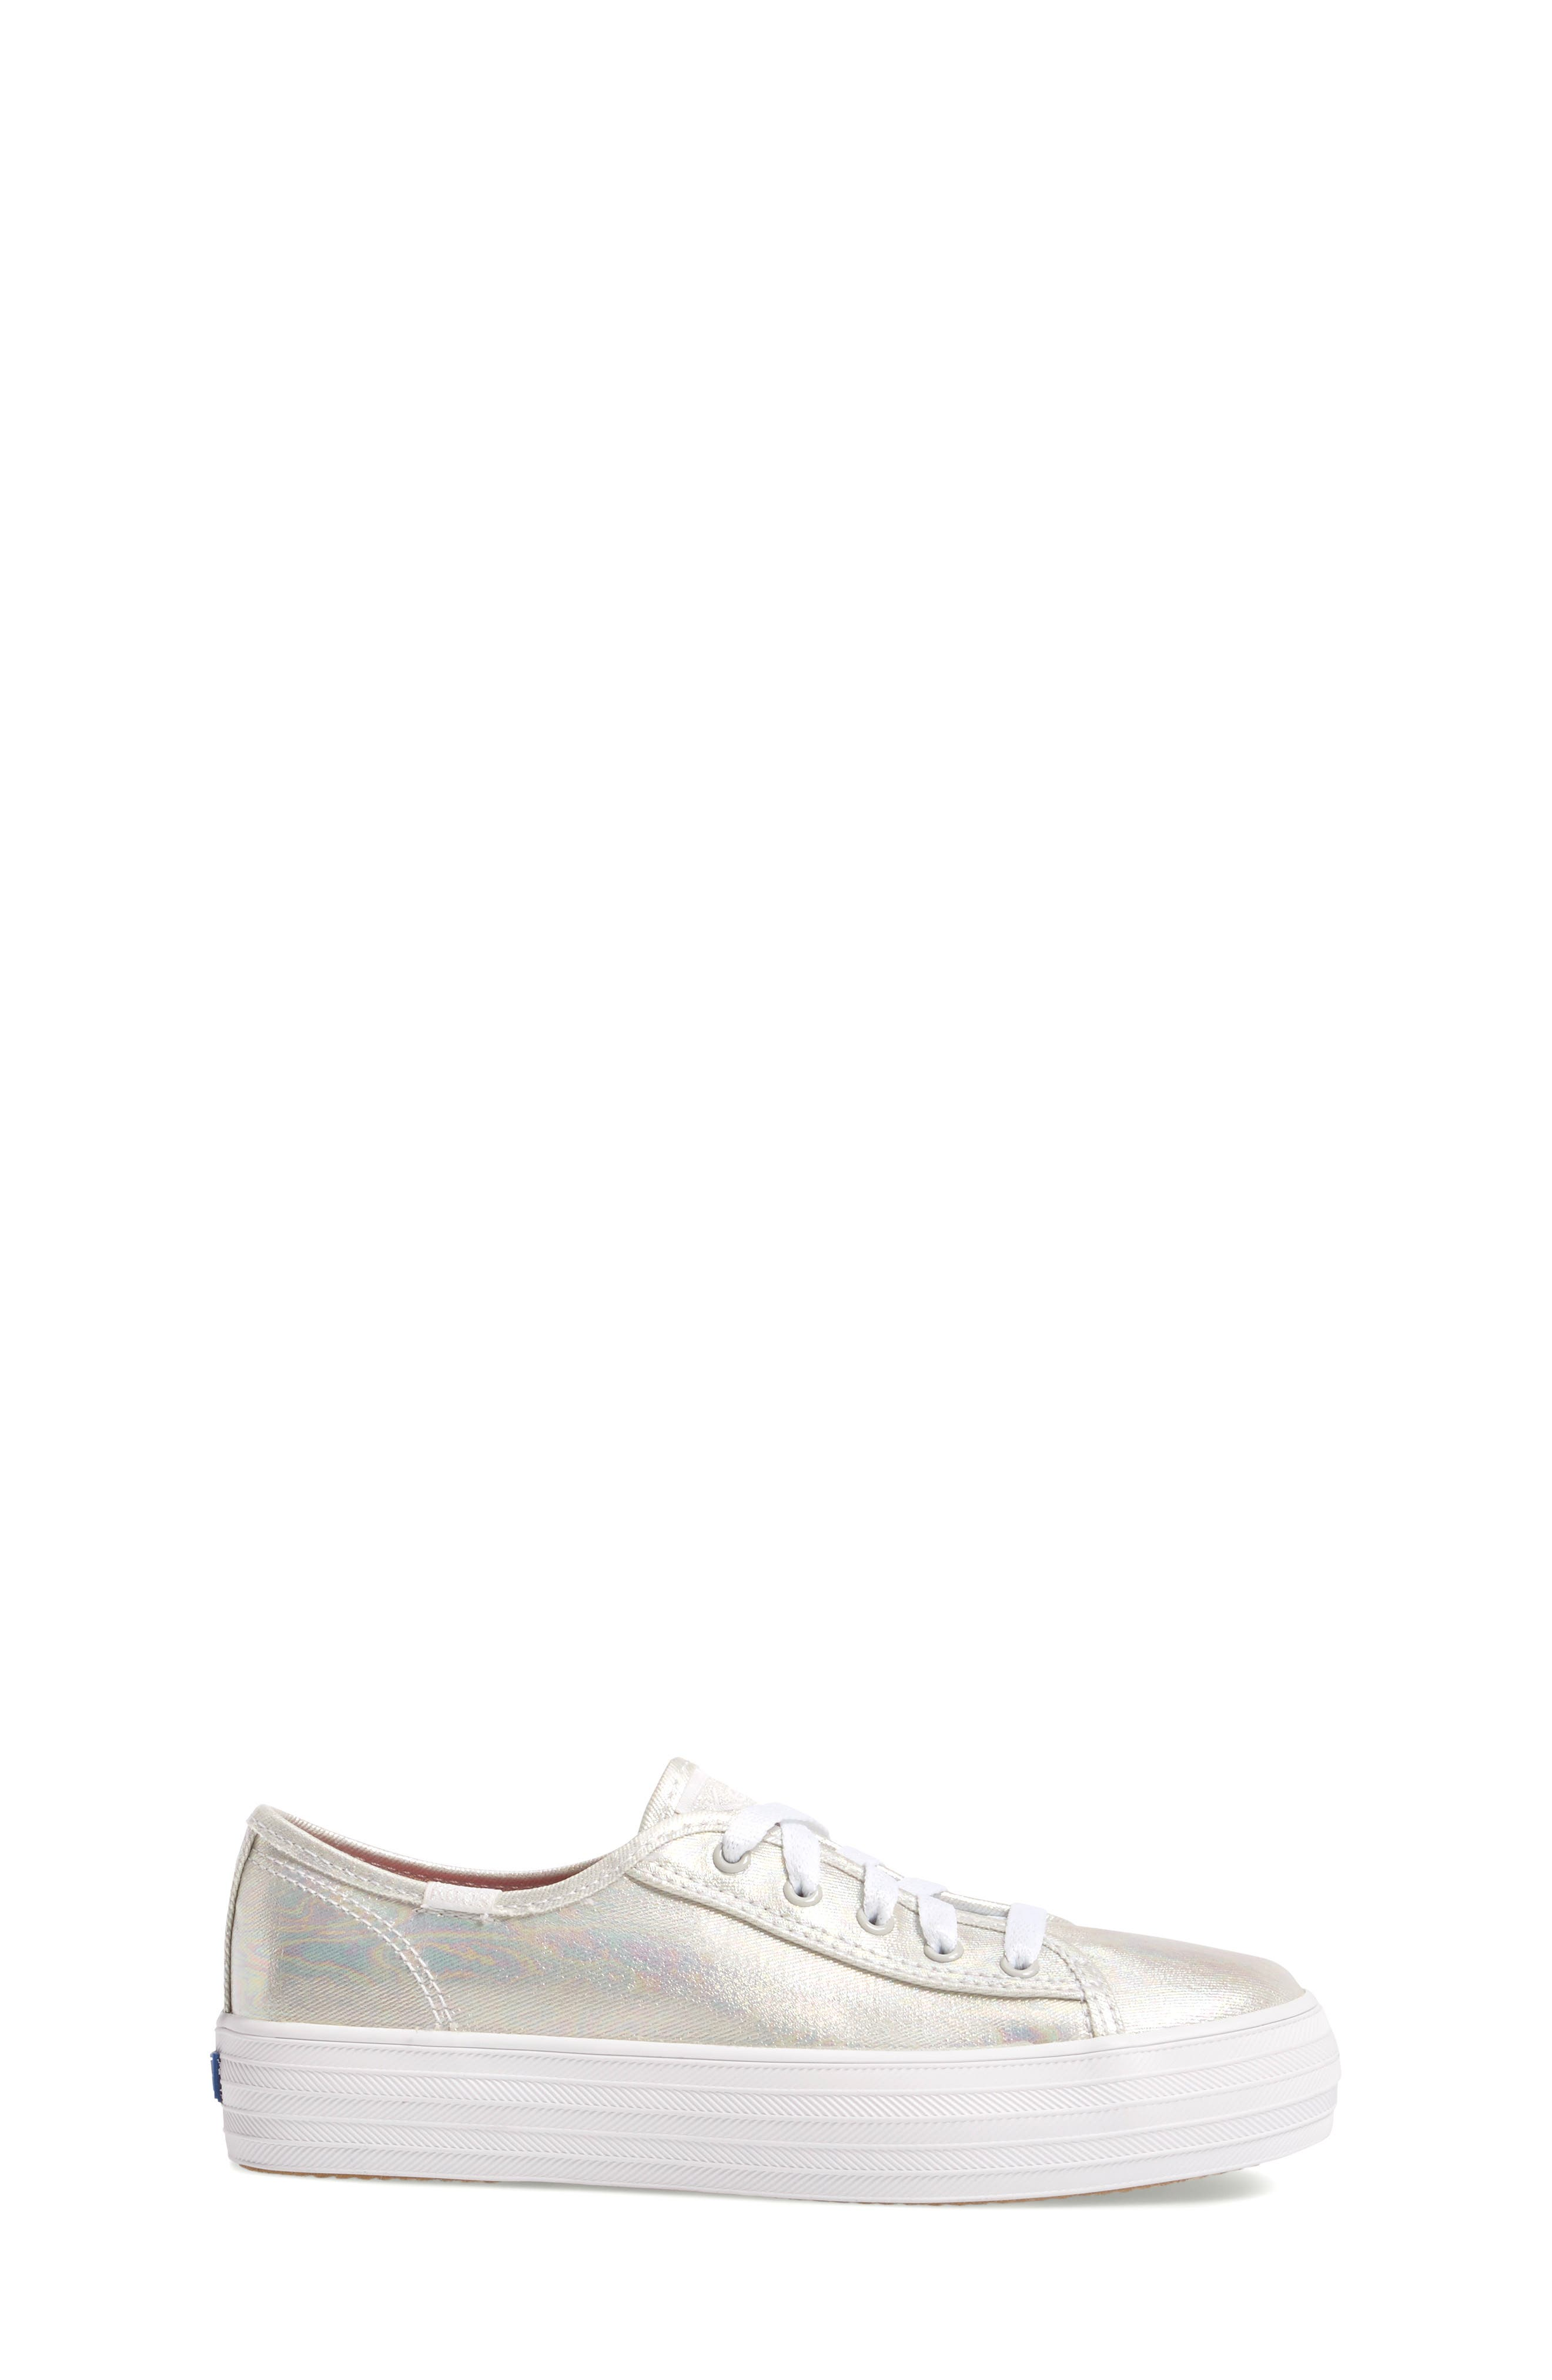 Triple Kick Platform Sneaker,                             Alternate thumbnail 3, color,                             020